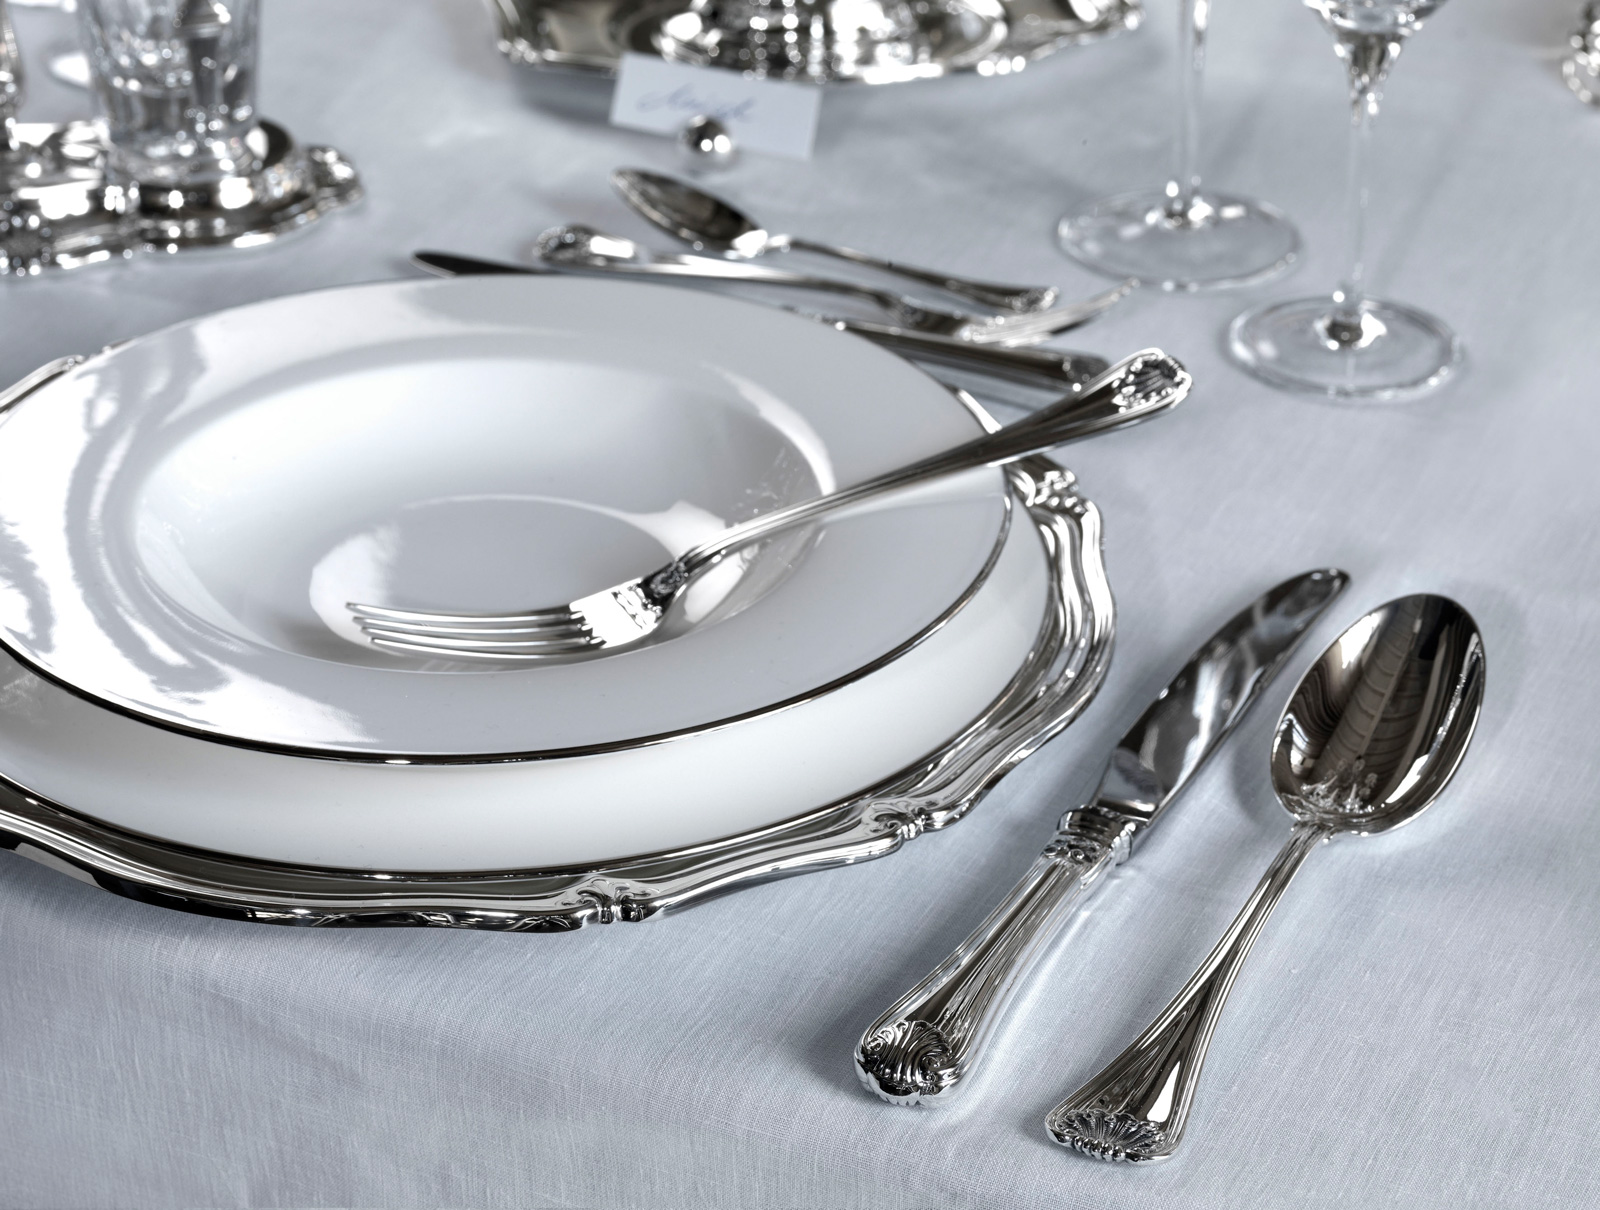 posate tavola elegante